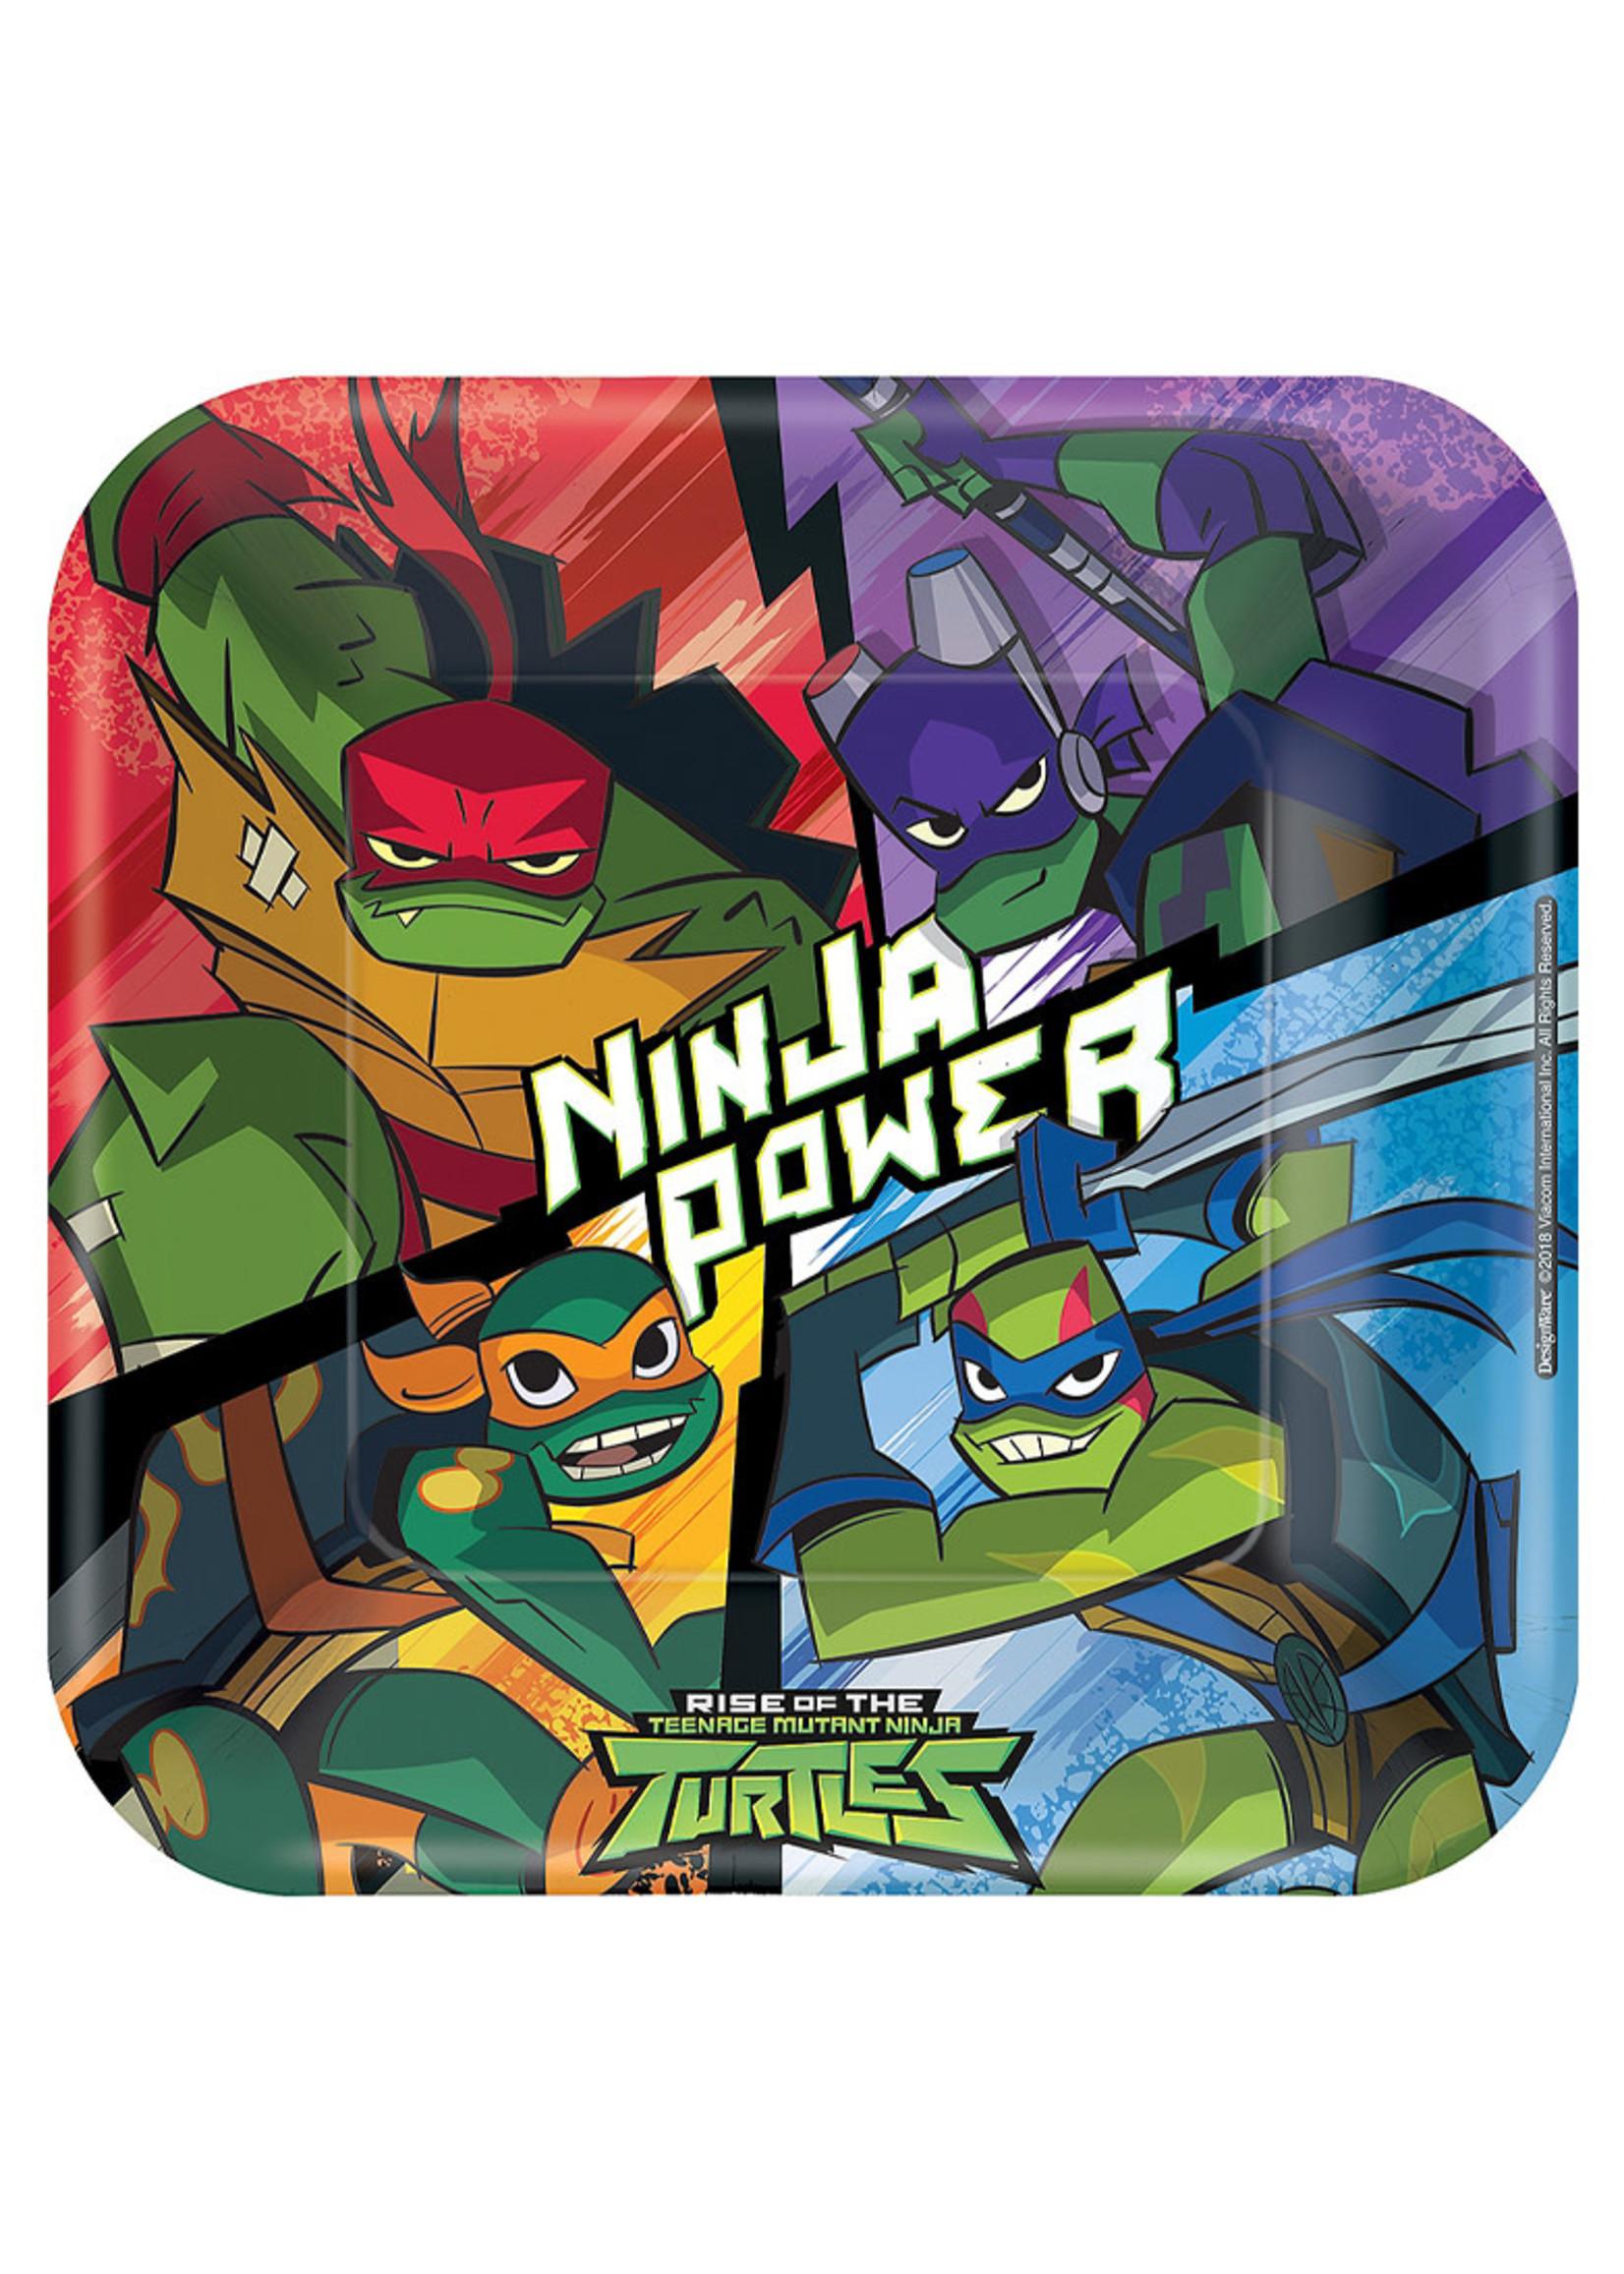 Rise of the Teenage Mutant Ninja Turtles Lunch Plates 8ct